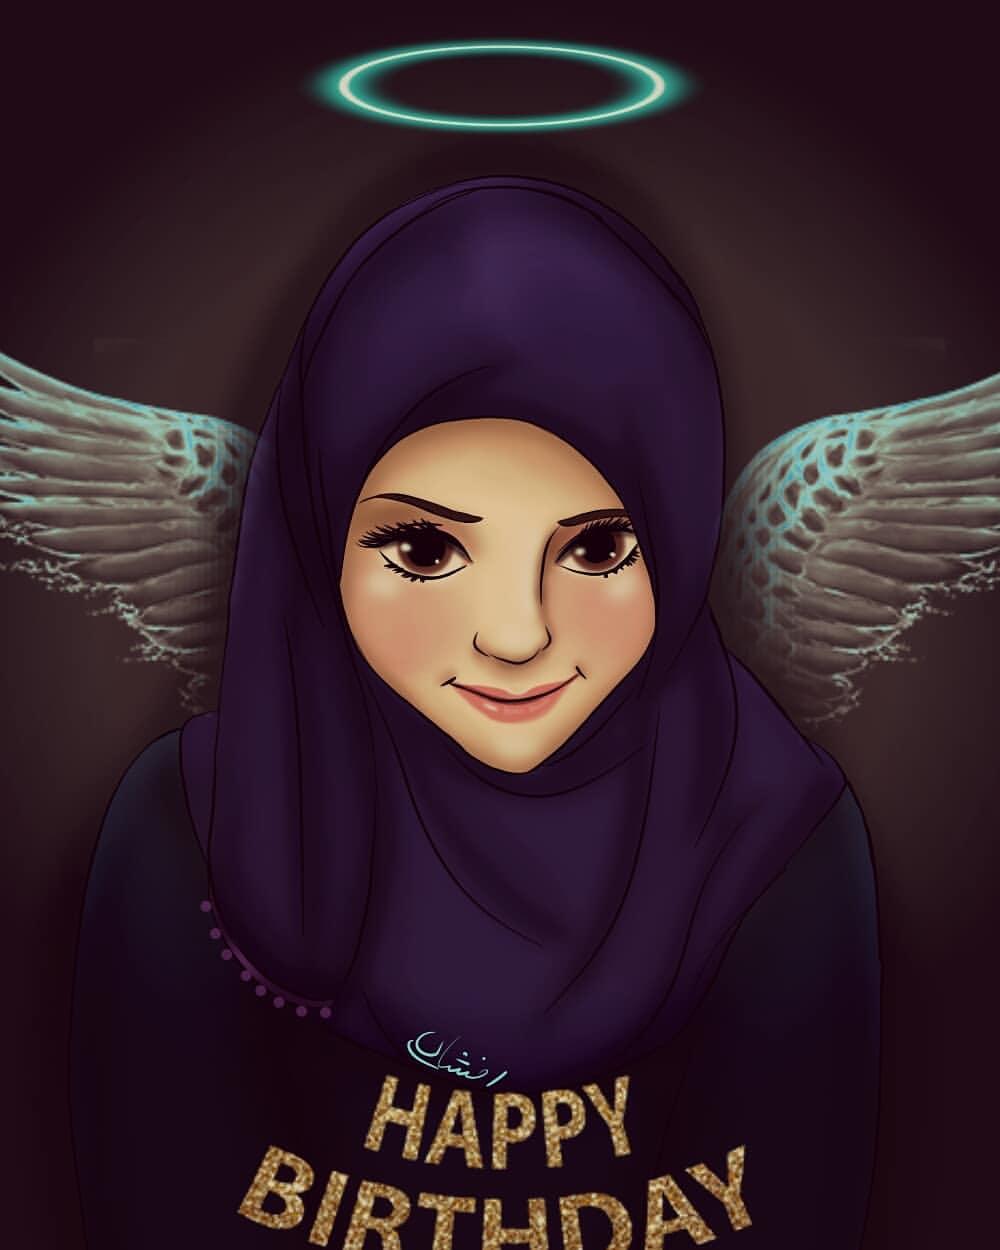 Happy Birtday Art Photo